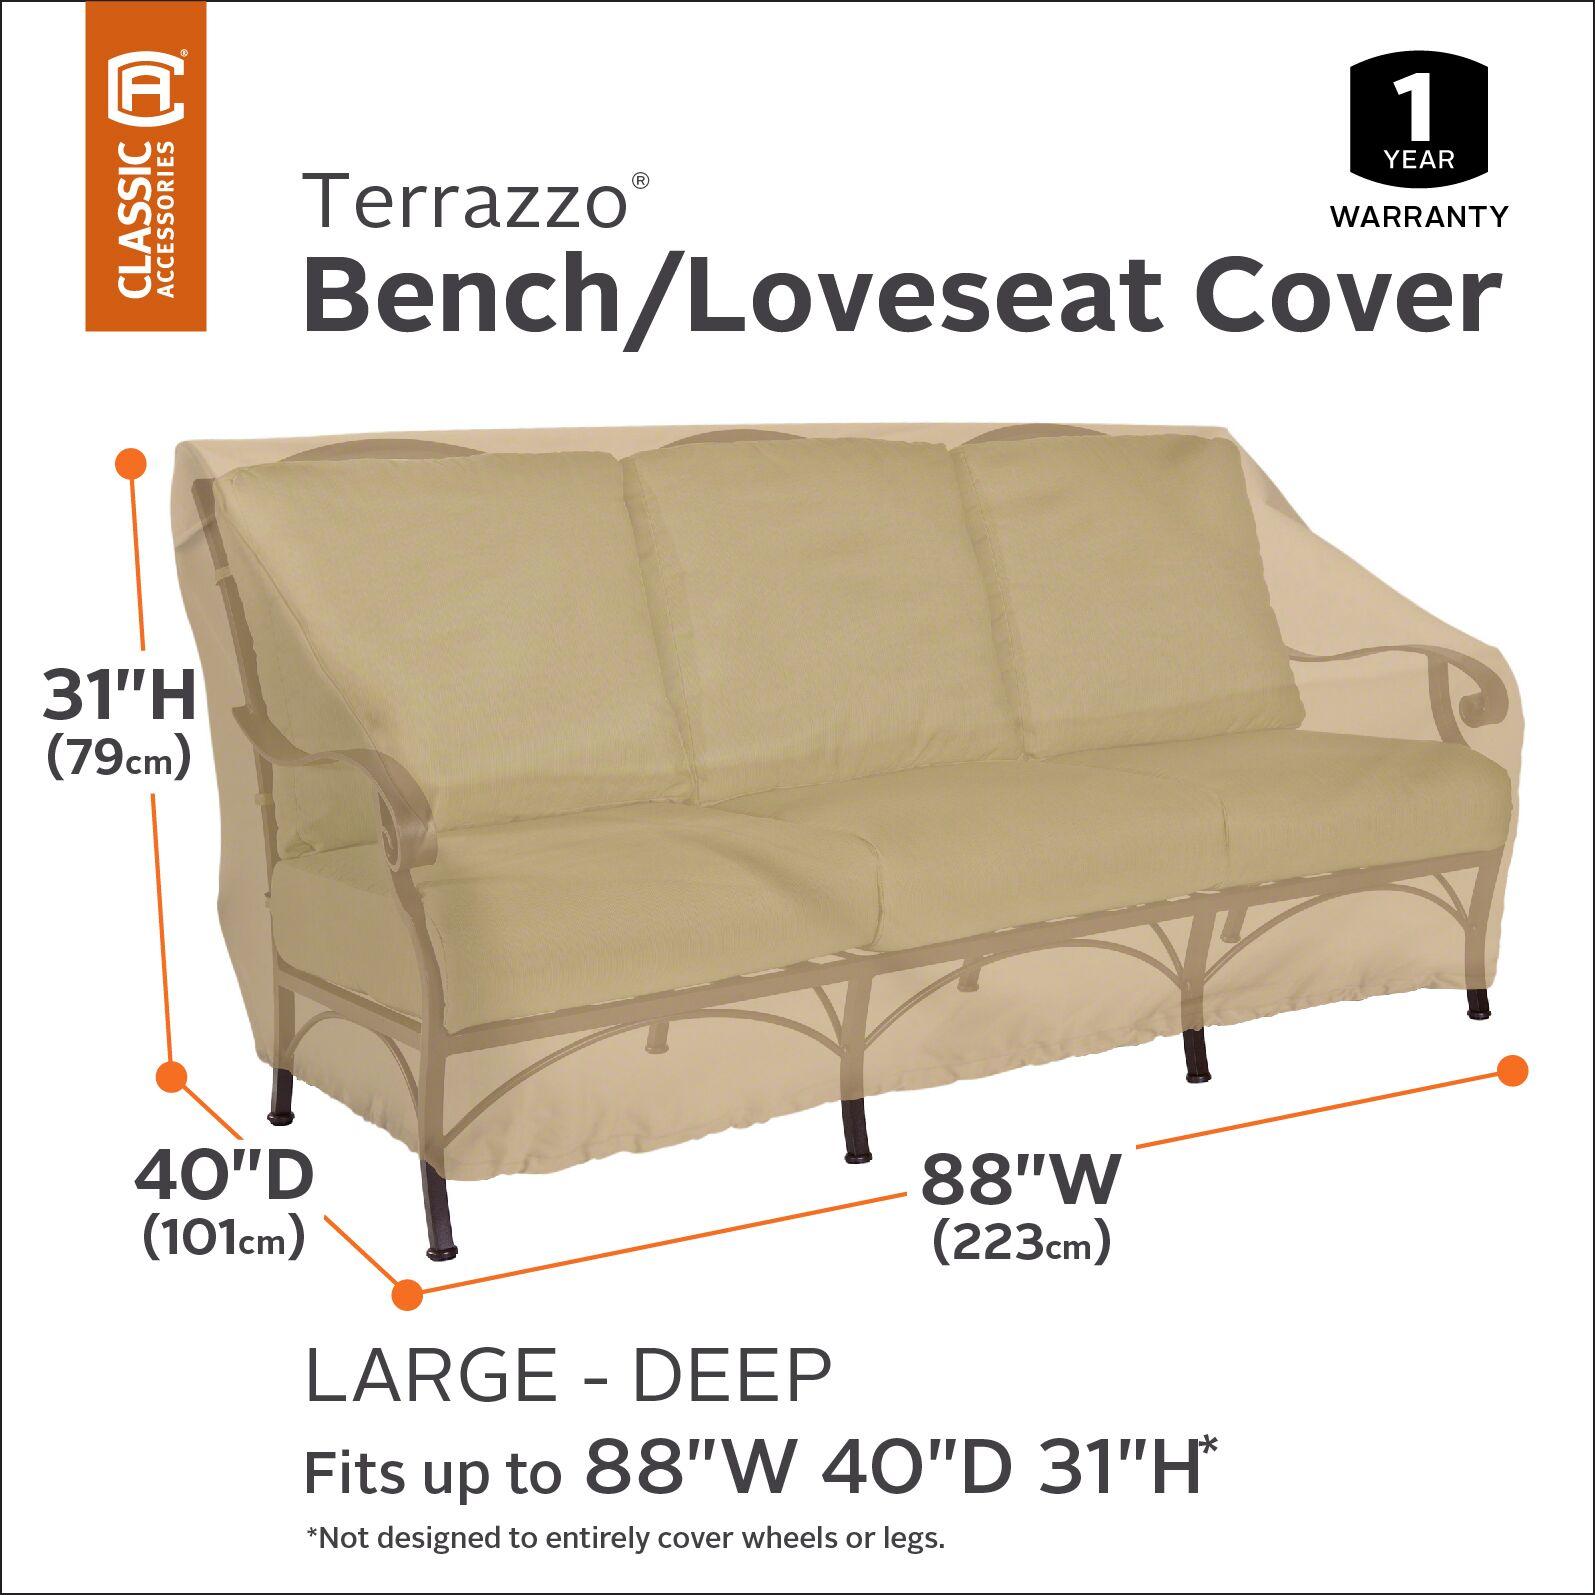 Deep Seated Patio Sofa Cover Size: 34